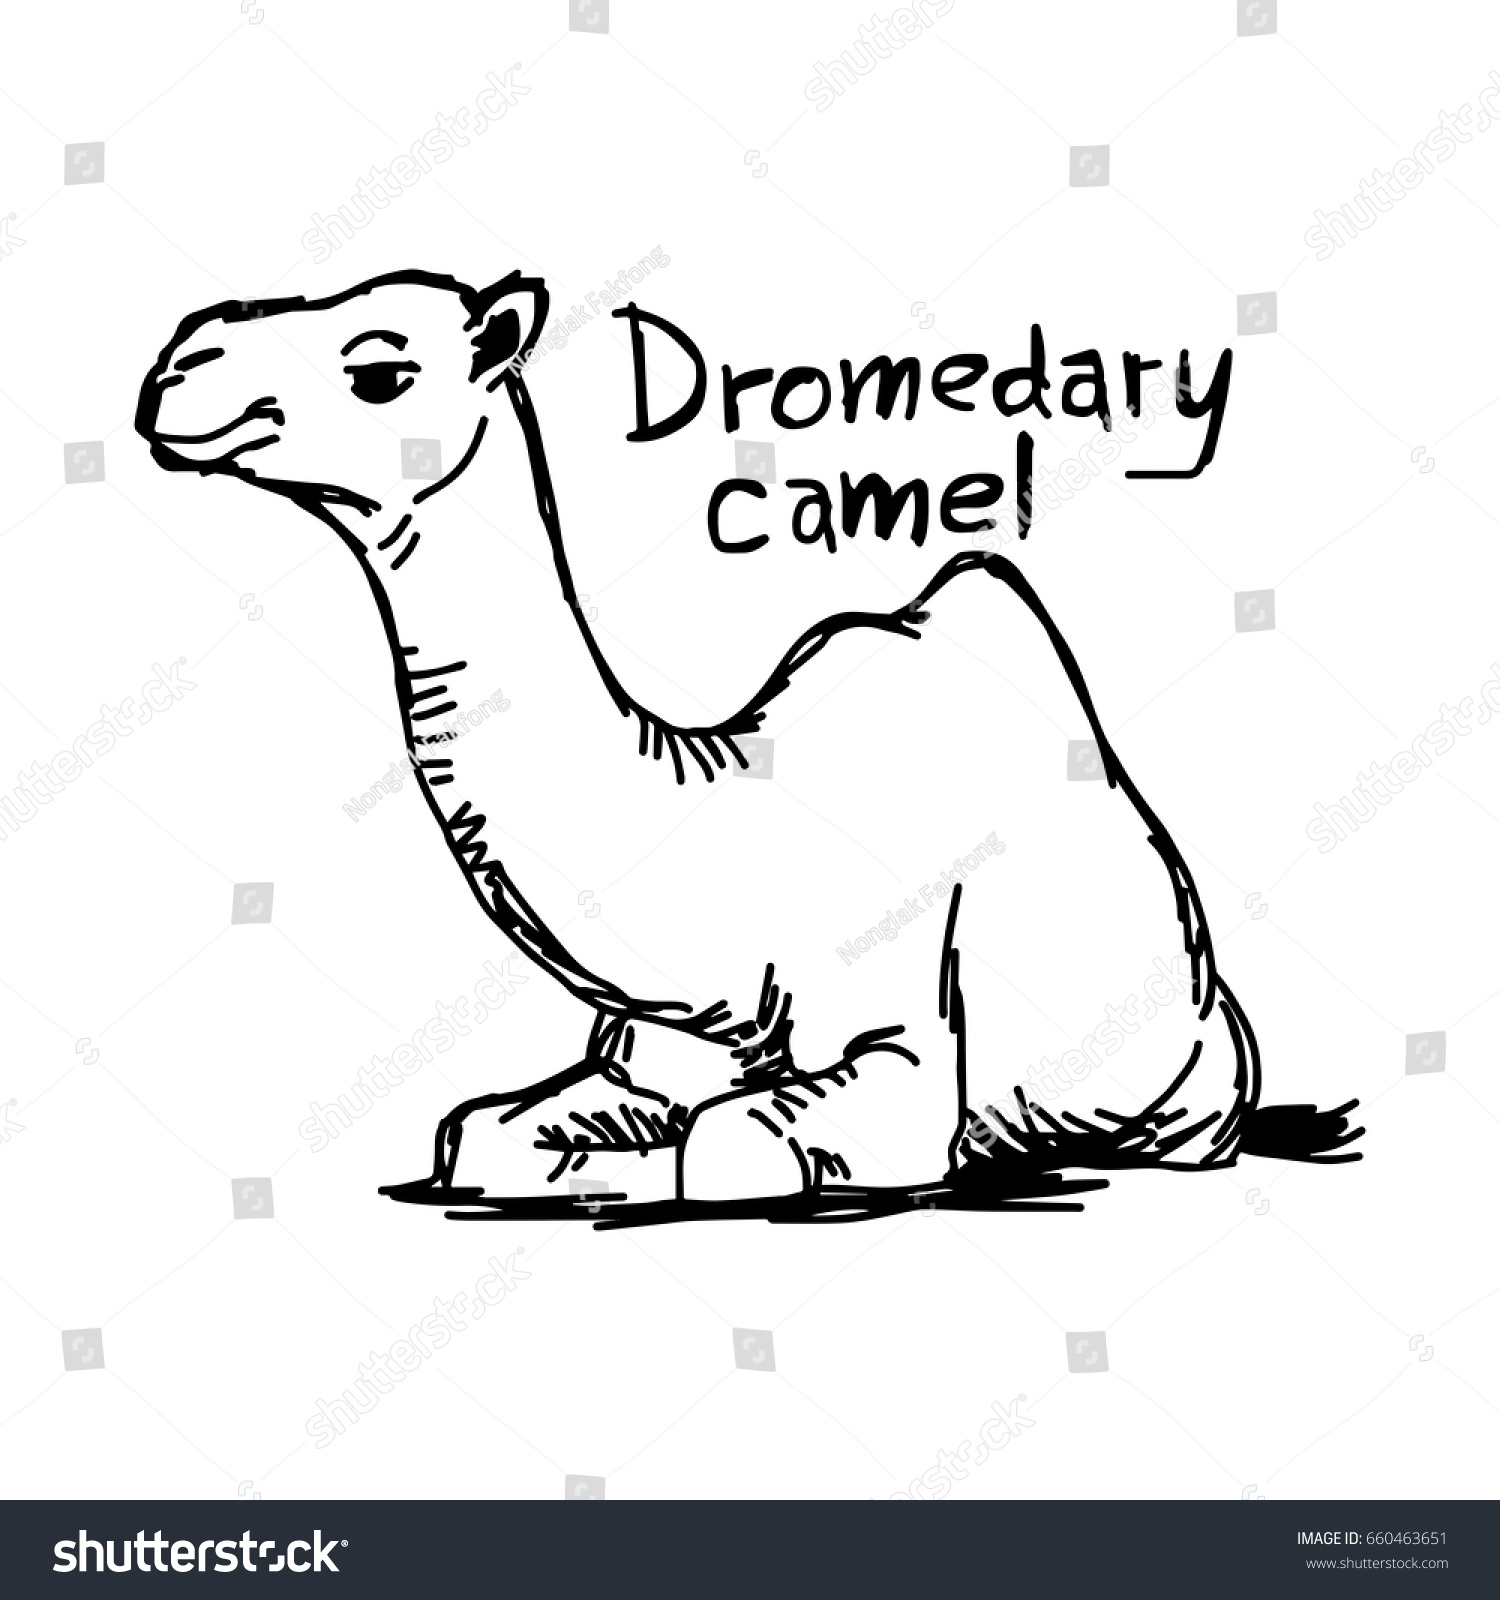 Dromedary Camel Sitting On Sand Vector Stock Vector HD (Royalty Free ...